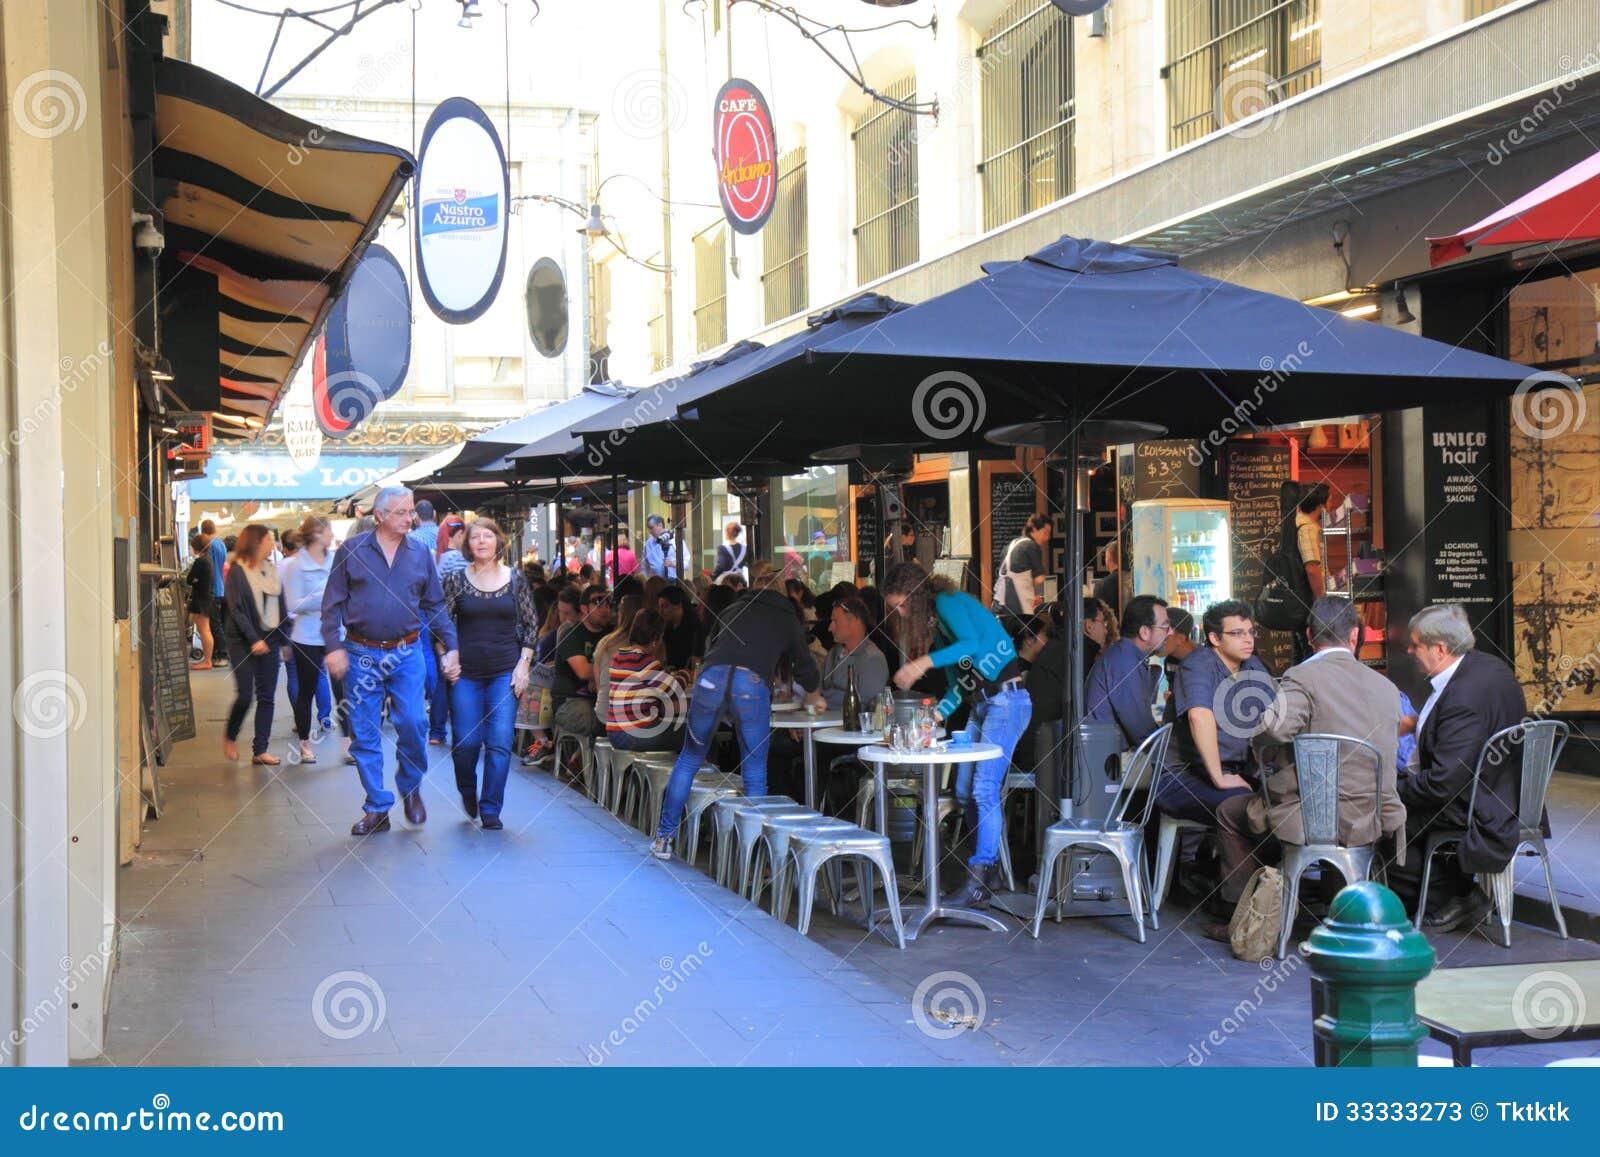 Date restaurants in Australia